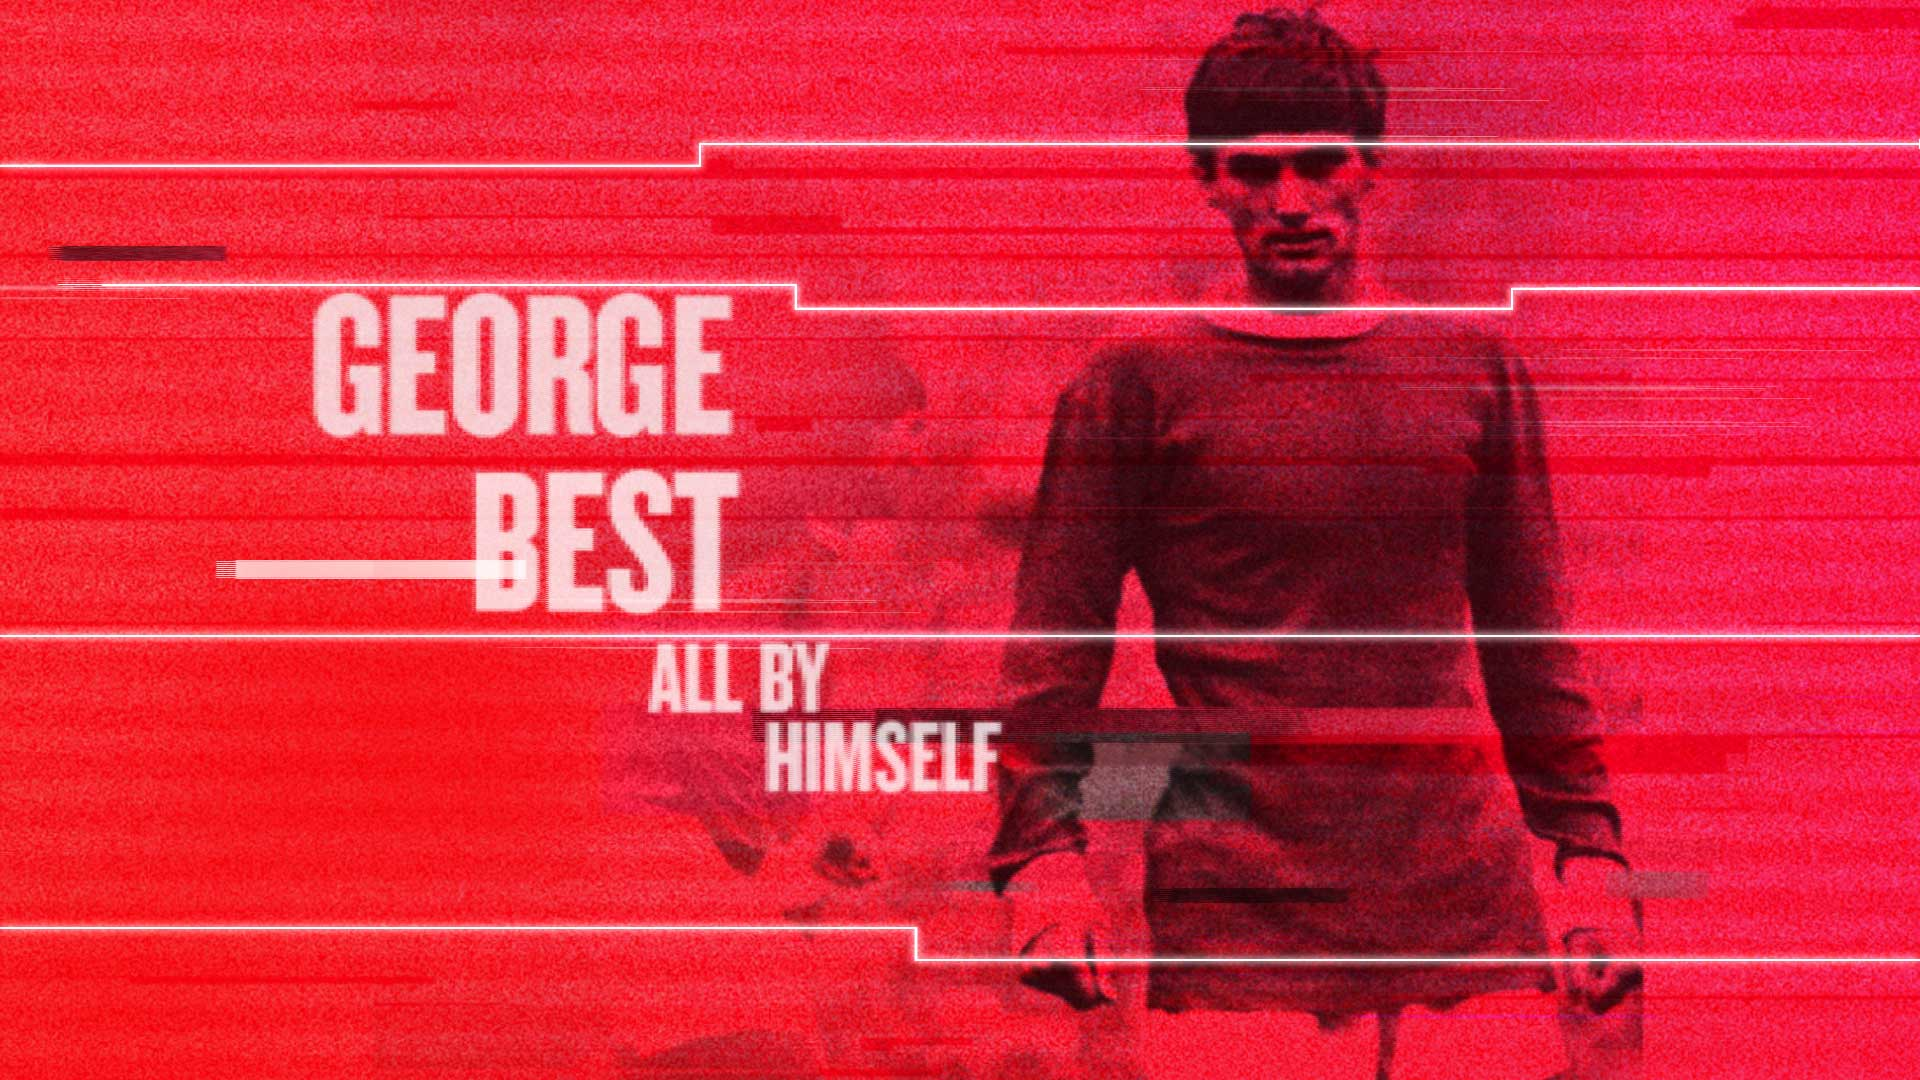 George_Best_Ident